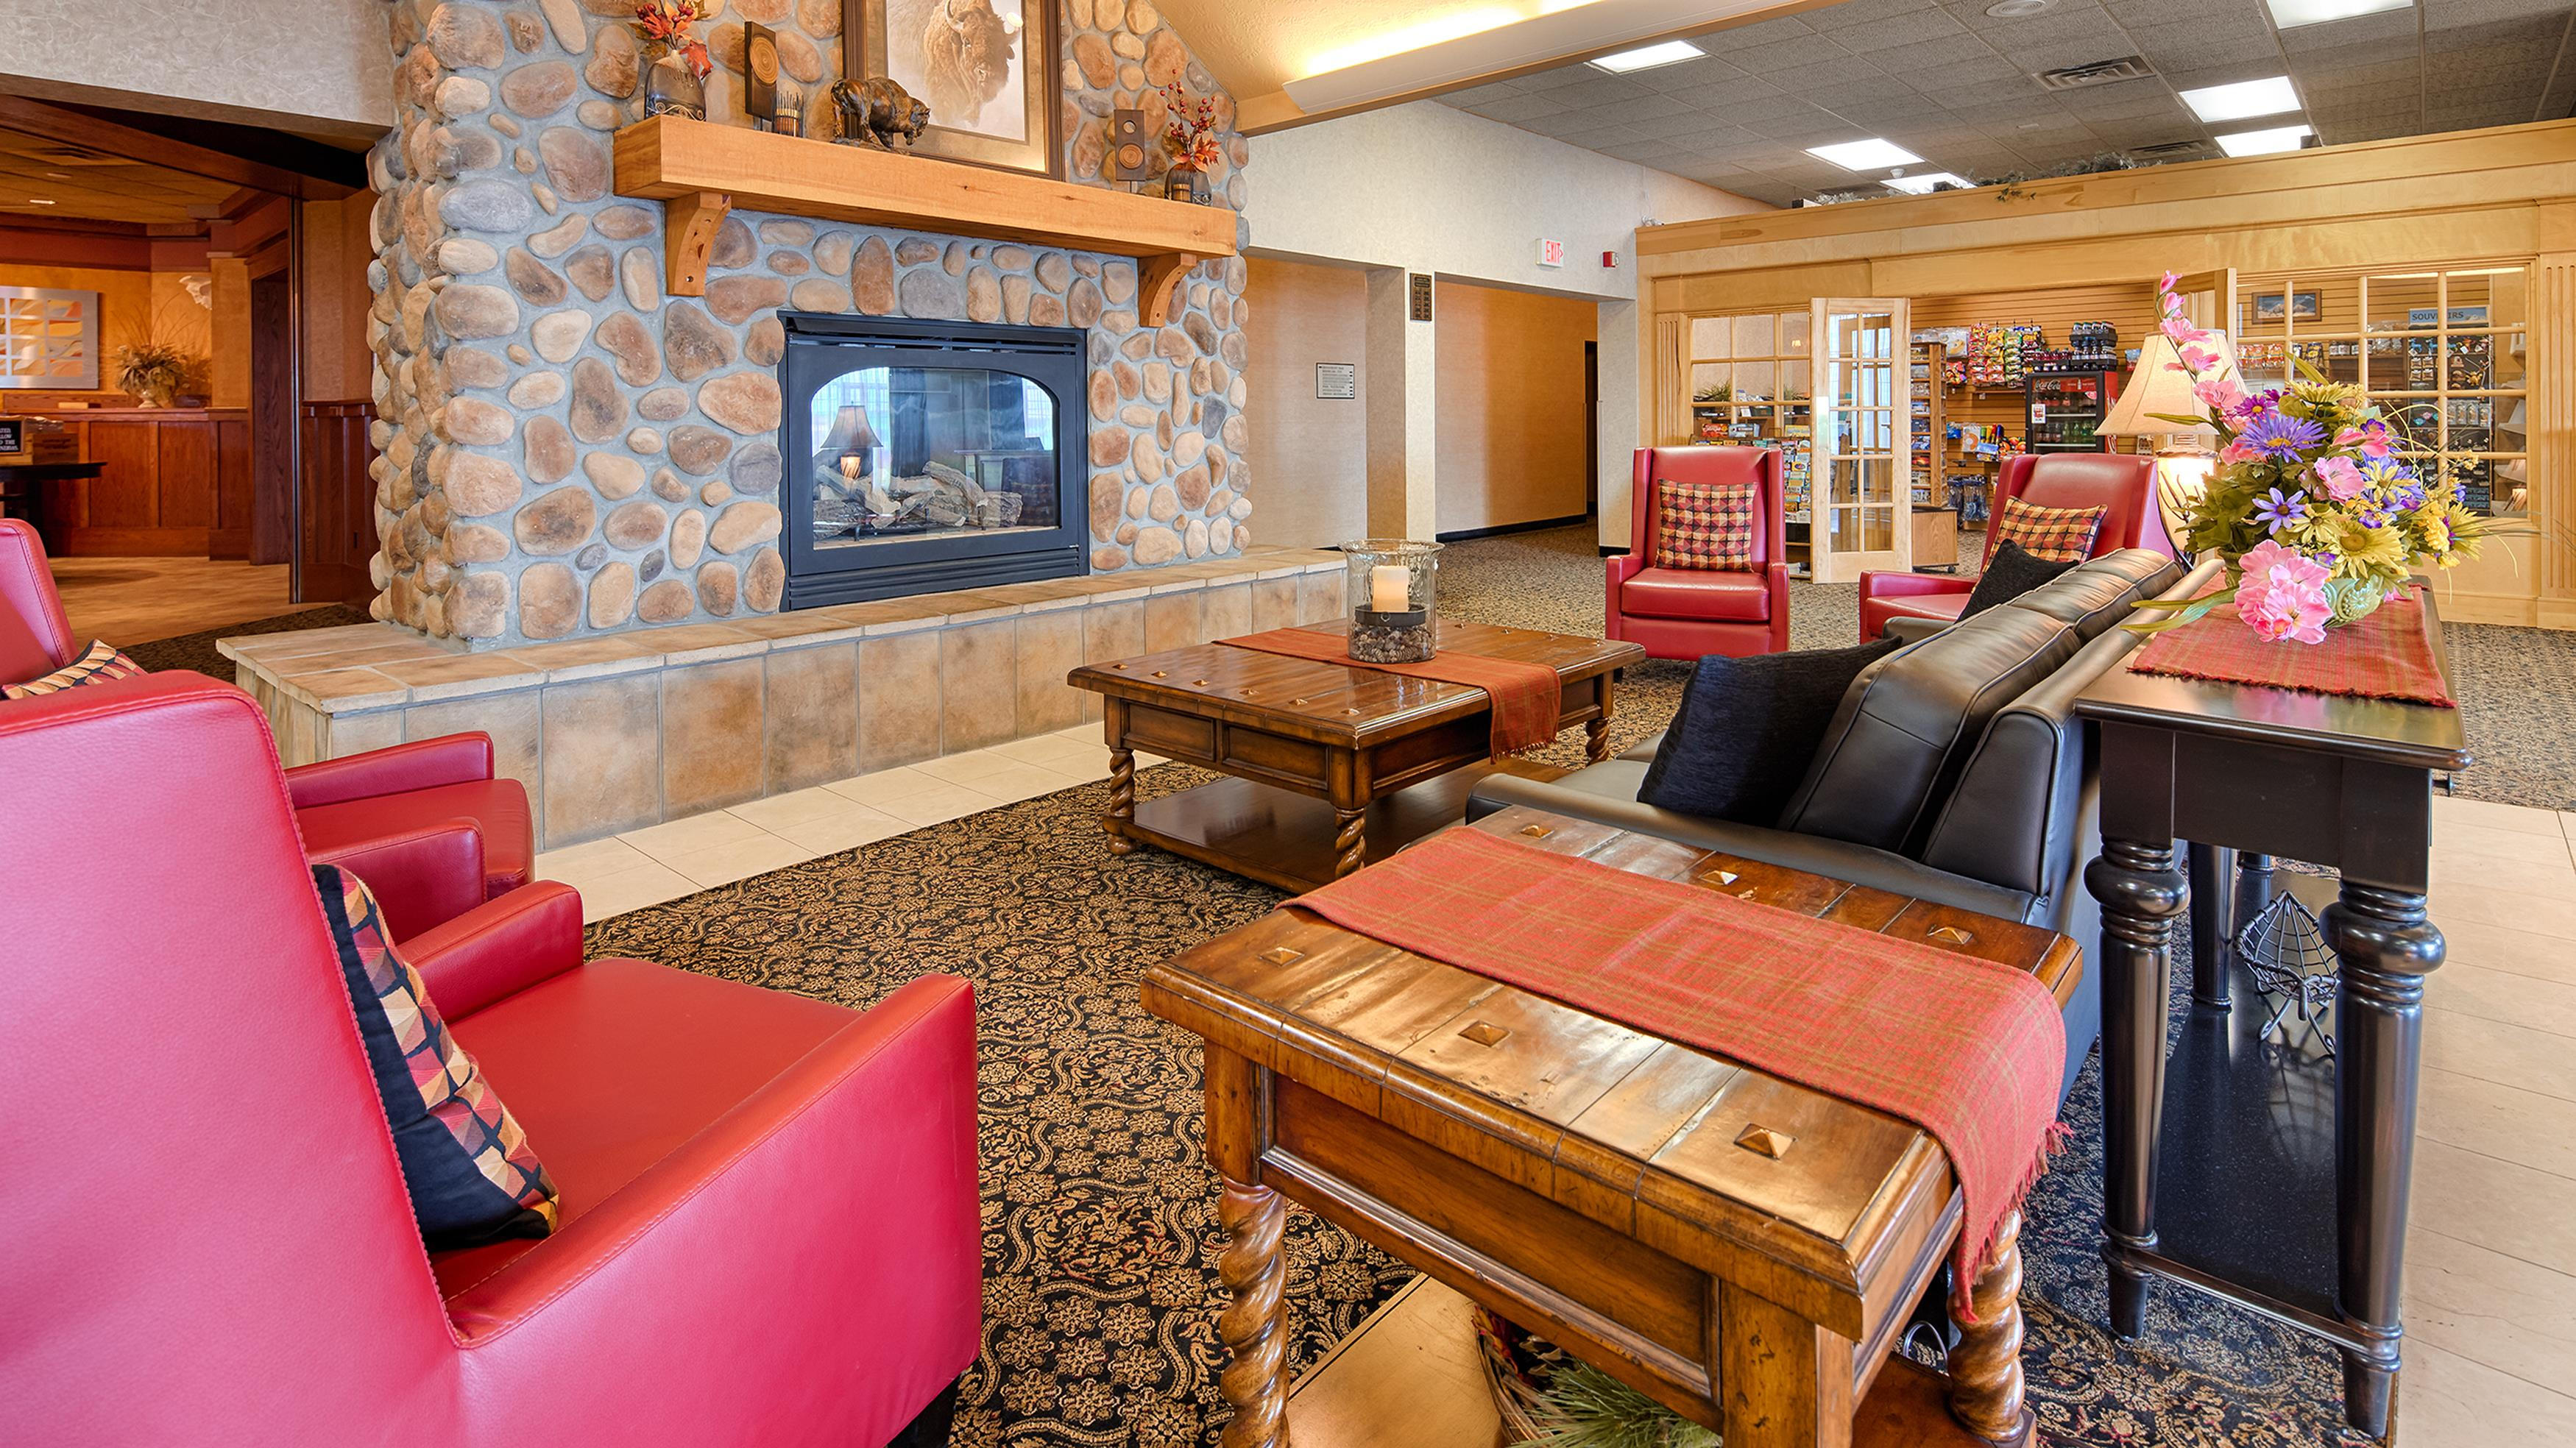 Best Western Ramkota Hotel image 4